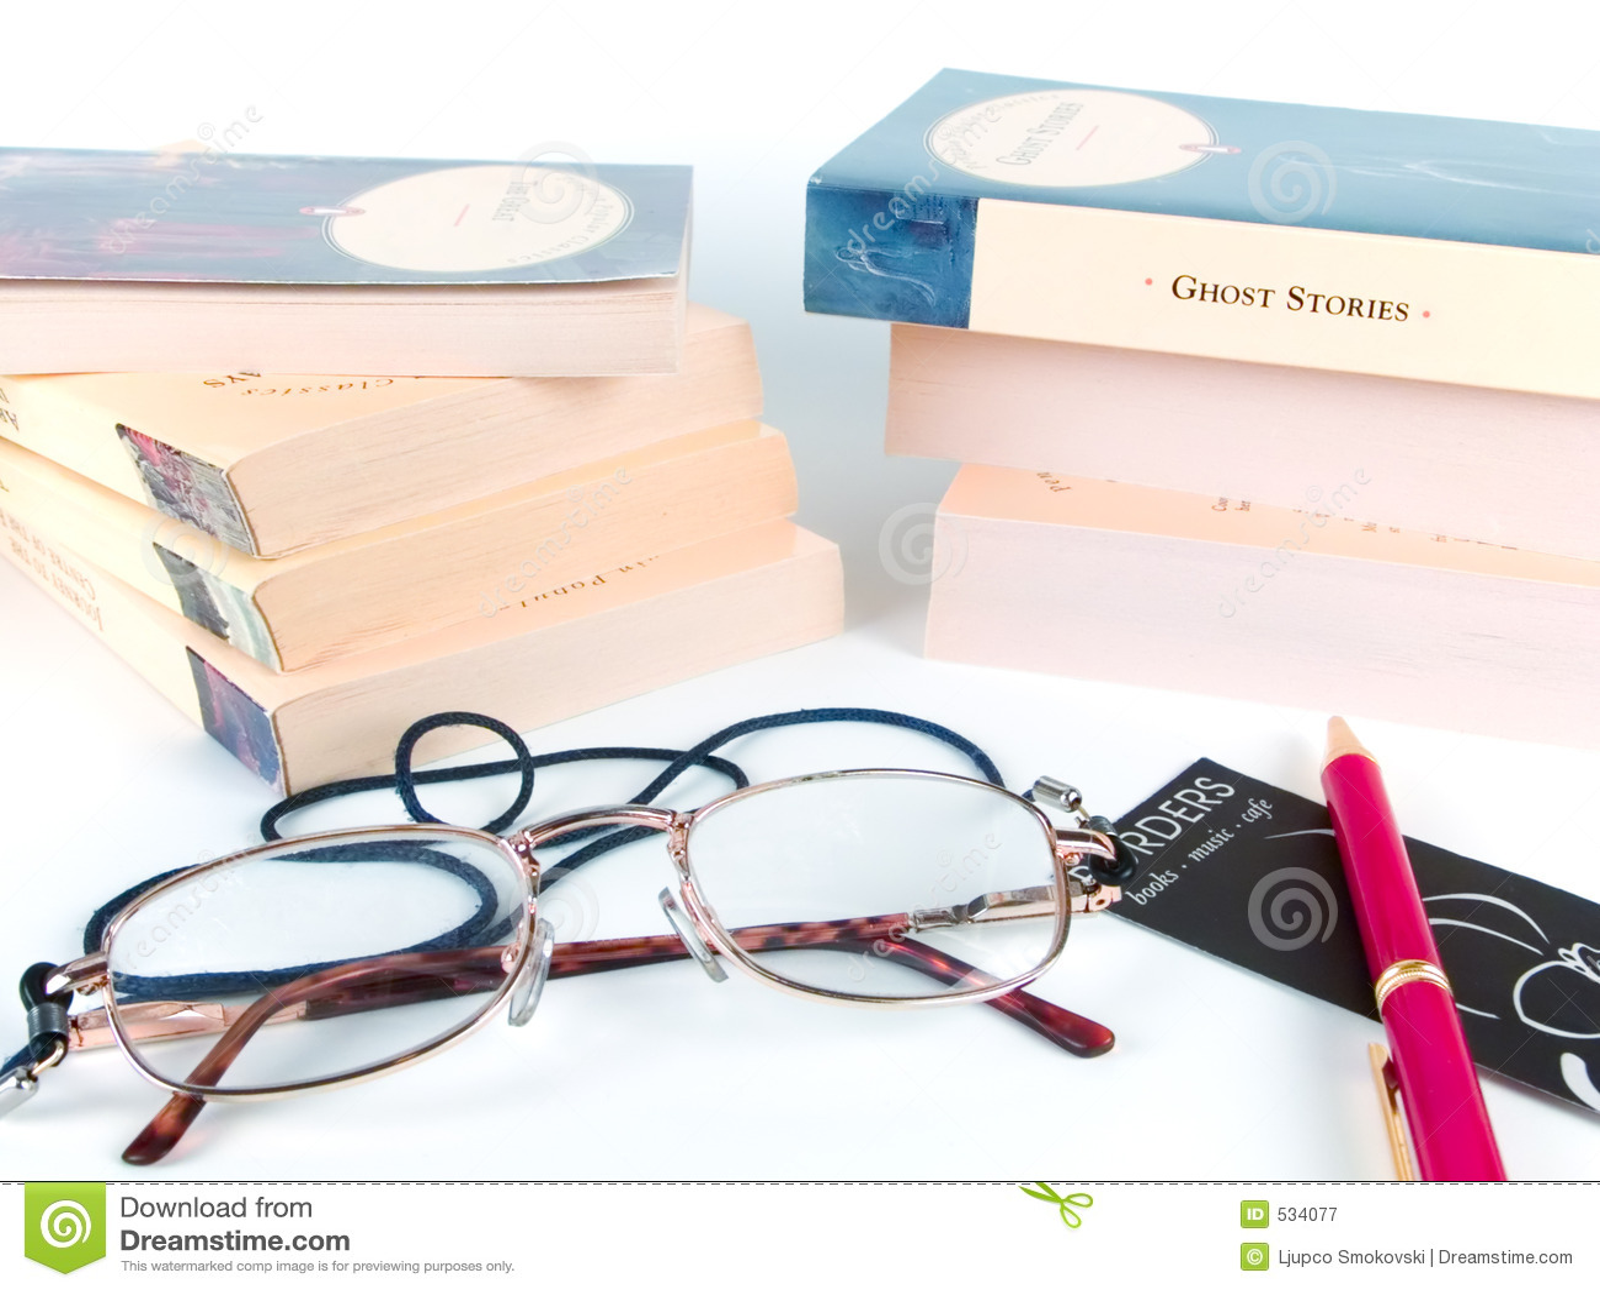 Download 登记玻璃笔 库存图片. 图片 包括有 英语, 词典, 历史记录, 语言, 框架, 折叠, 钉书匠, 放大, 镜片 - 534077